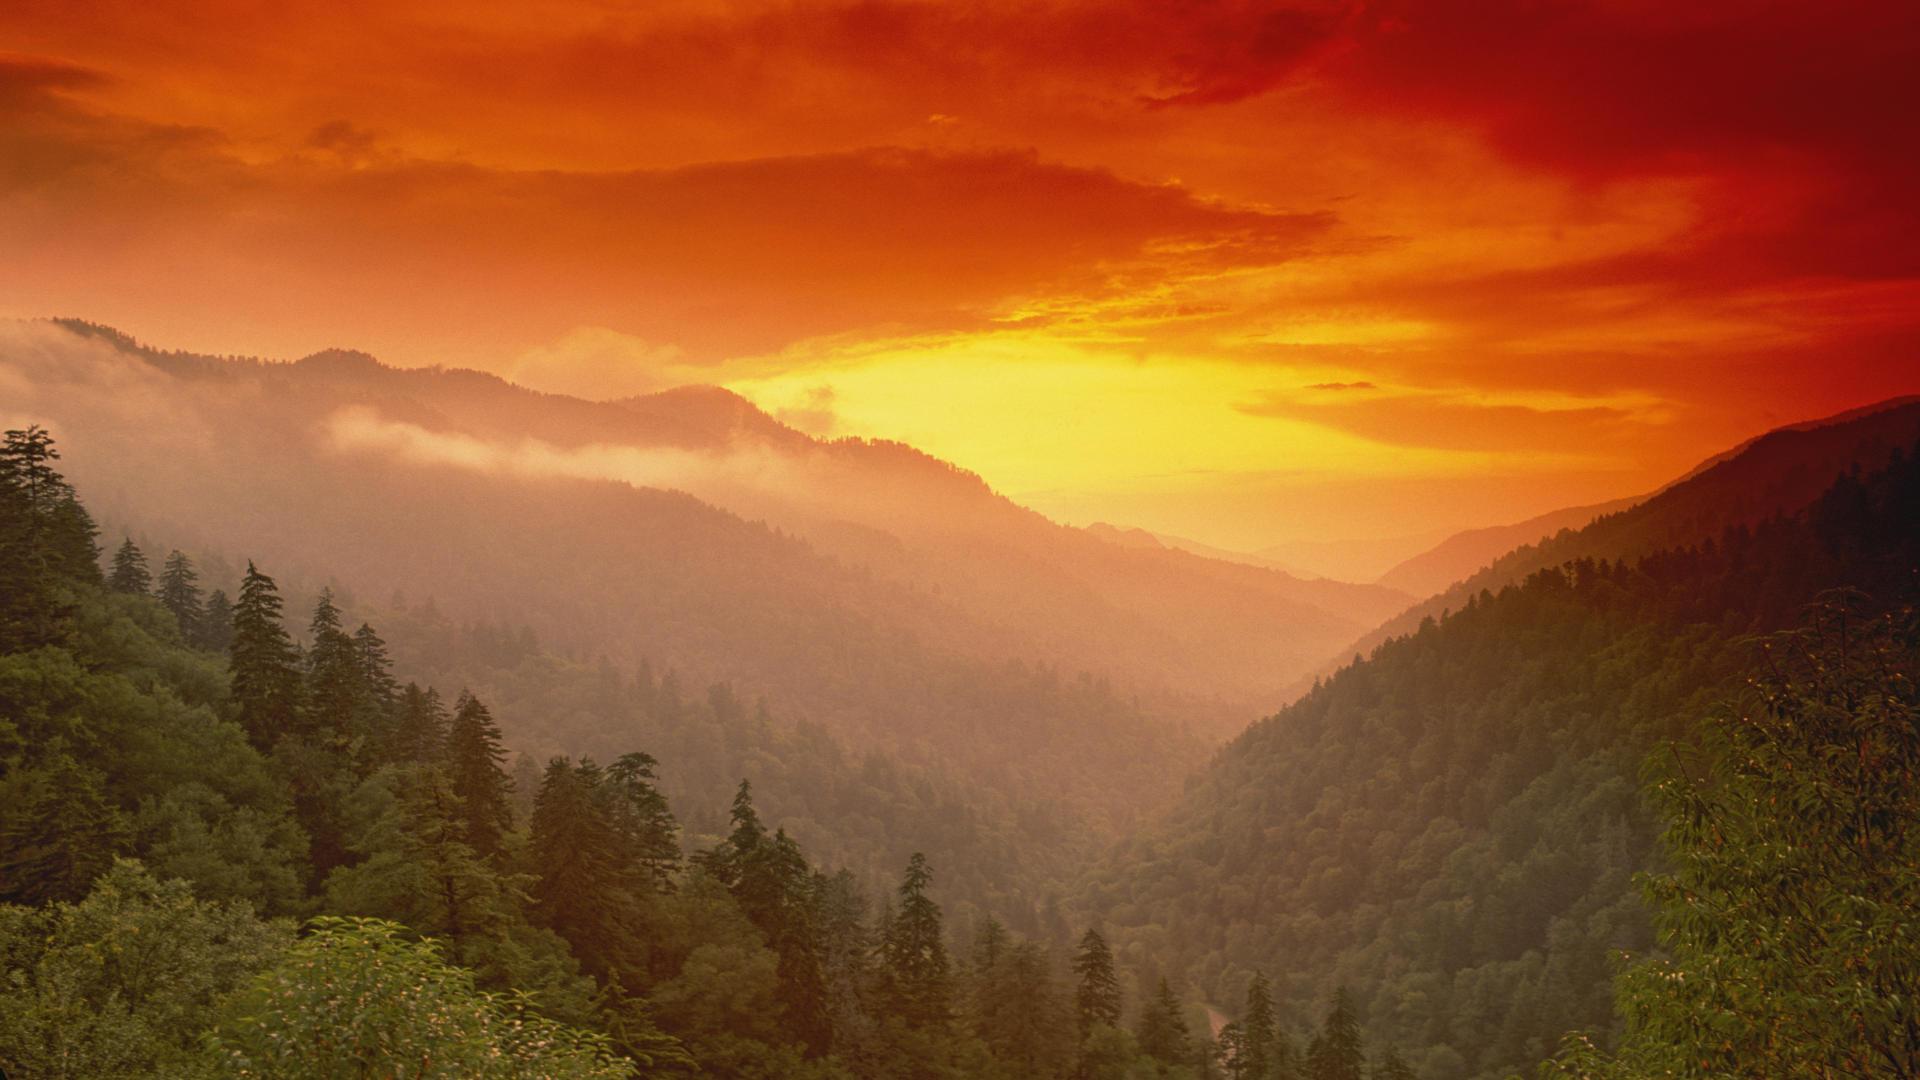 42] Smoky Mountain Wallpaper Desktop on WallpaperSafari 1920x1080